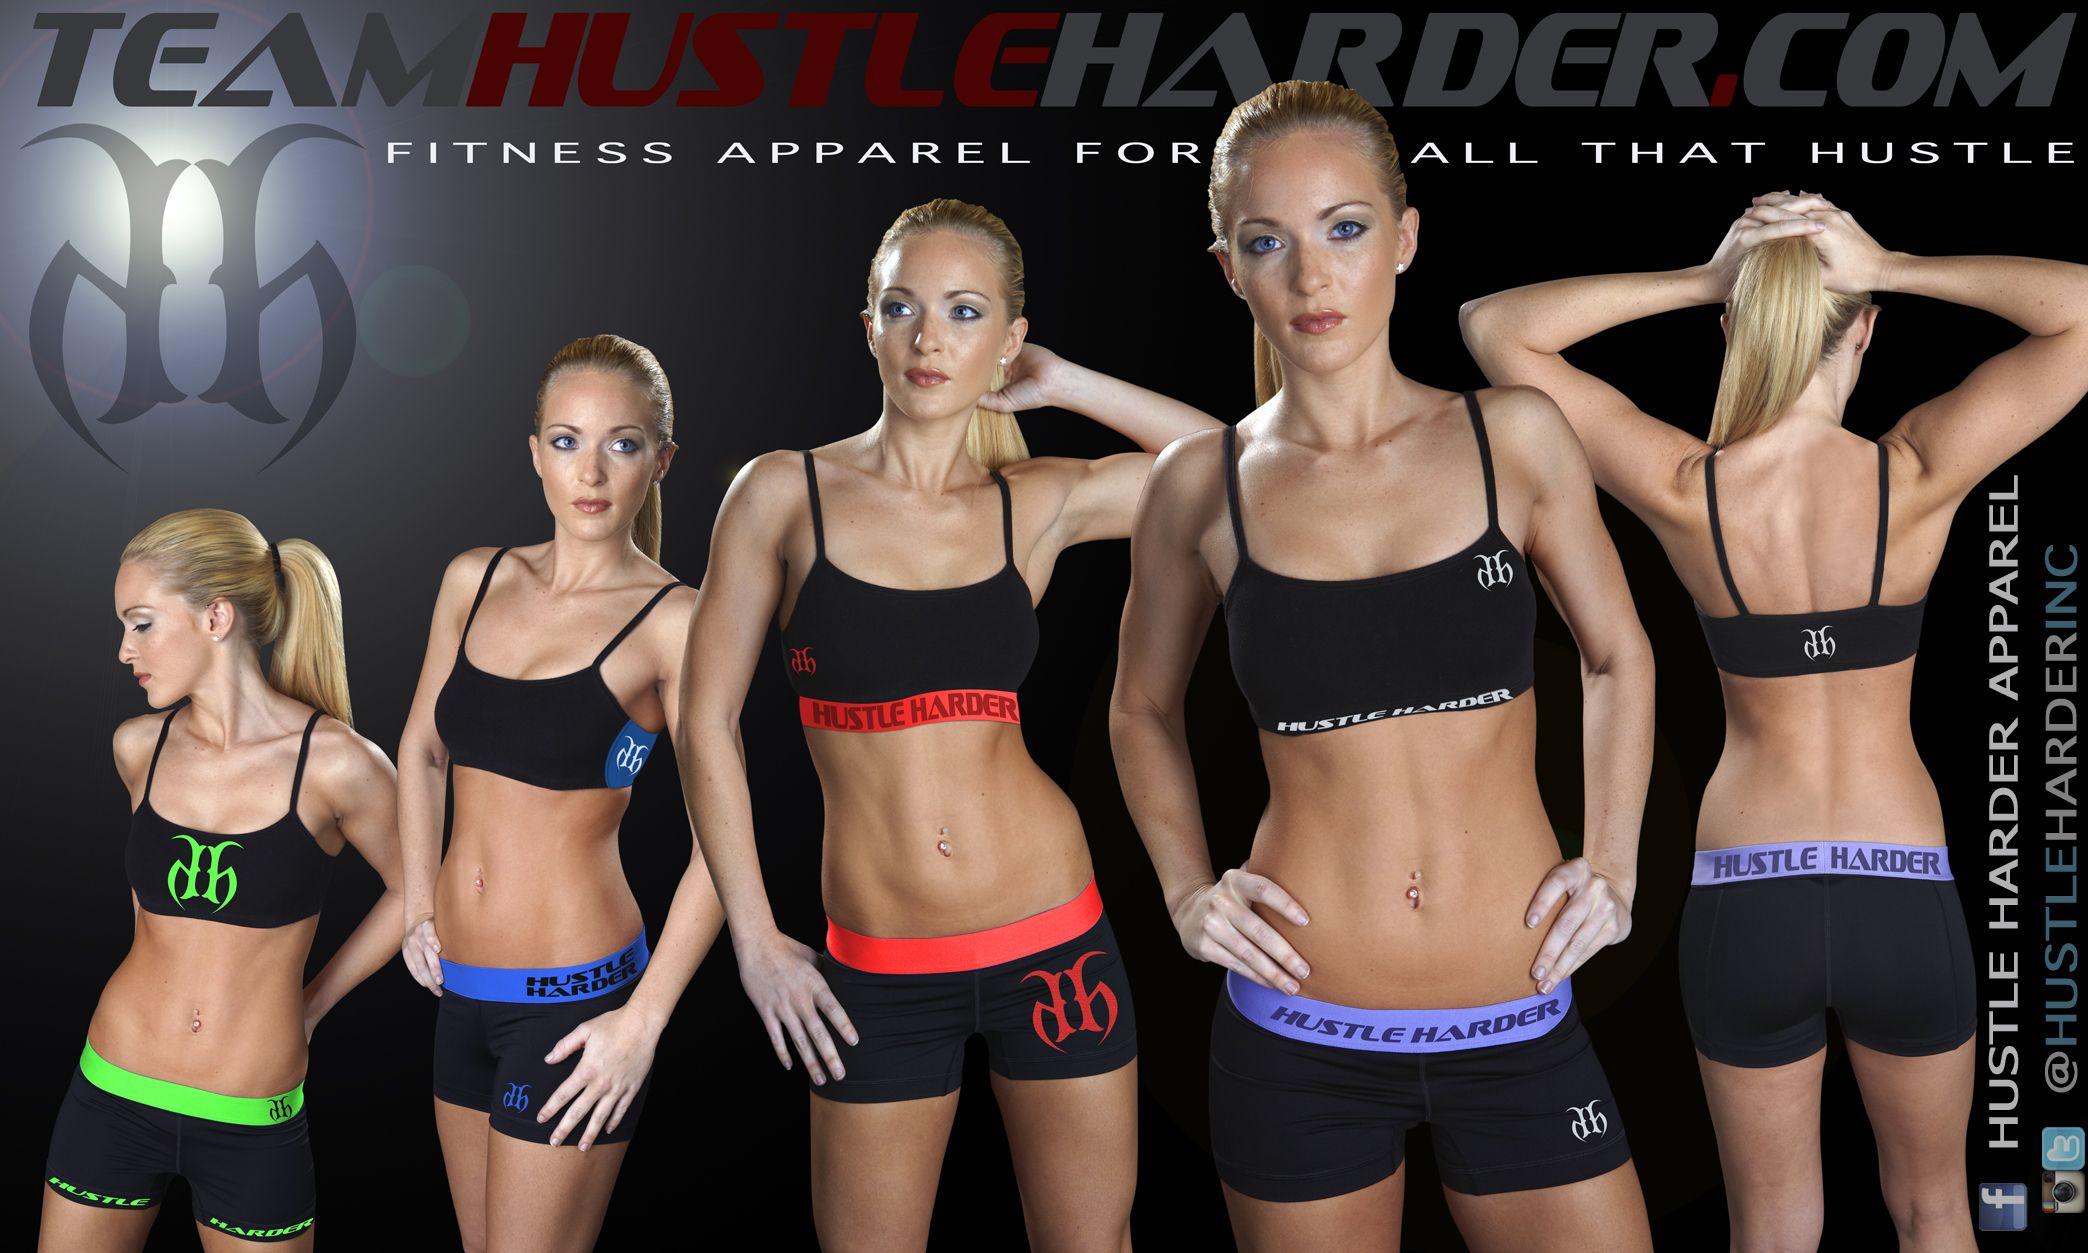 From teamhustleharder.com Follow teamhustleharder.com on instagram  twitter #hh #diet #healthy #lifestyle #exercise #fashion #workout #hustleharder #w…